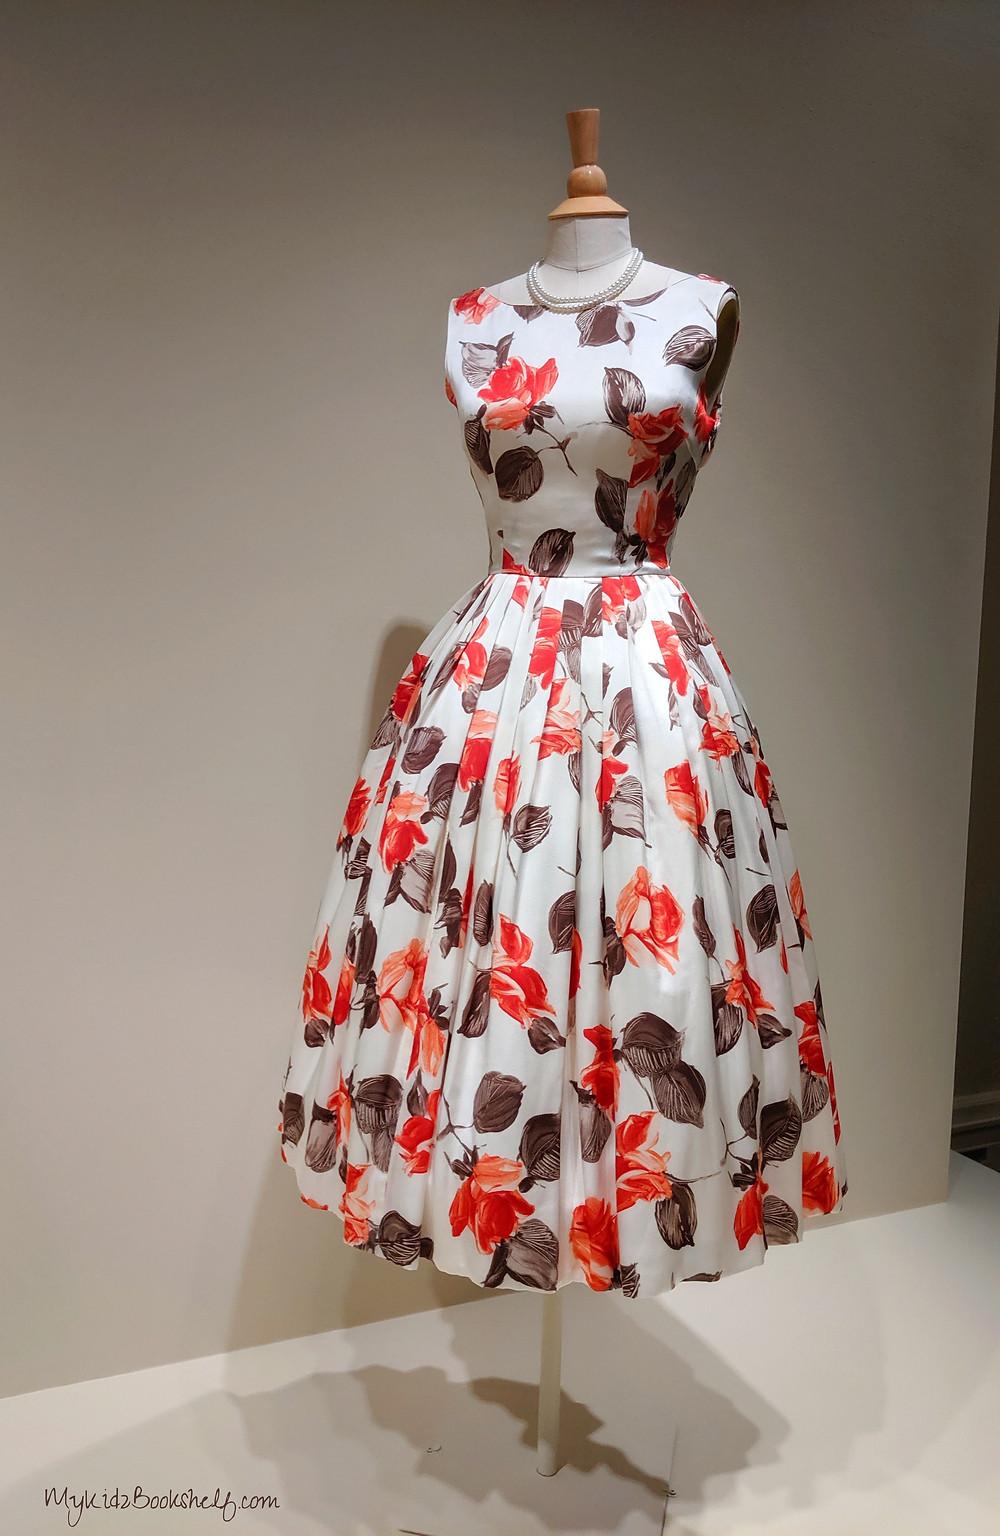 Dress-worn-by-Claire-Foy-as-Queen-Elizabeth-in-Netflix-original-series-The-Crown